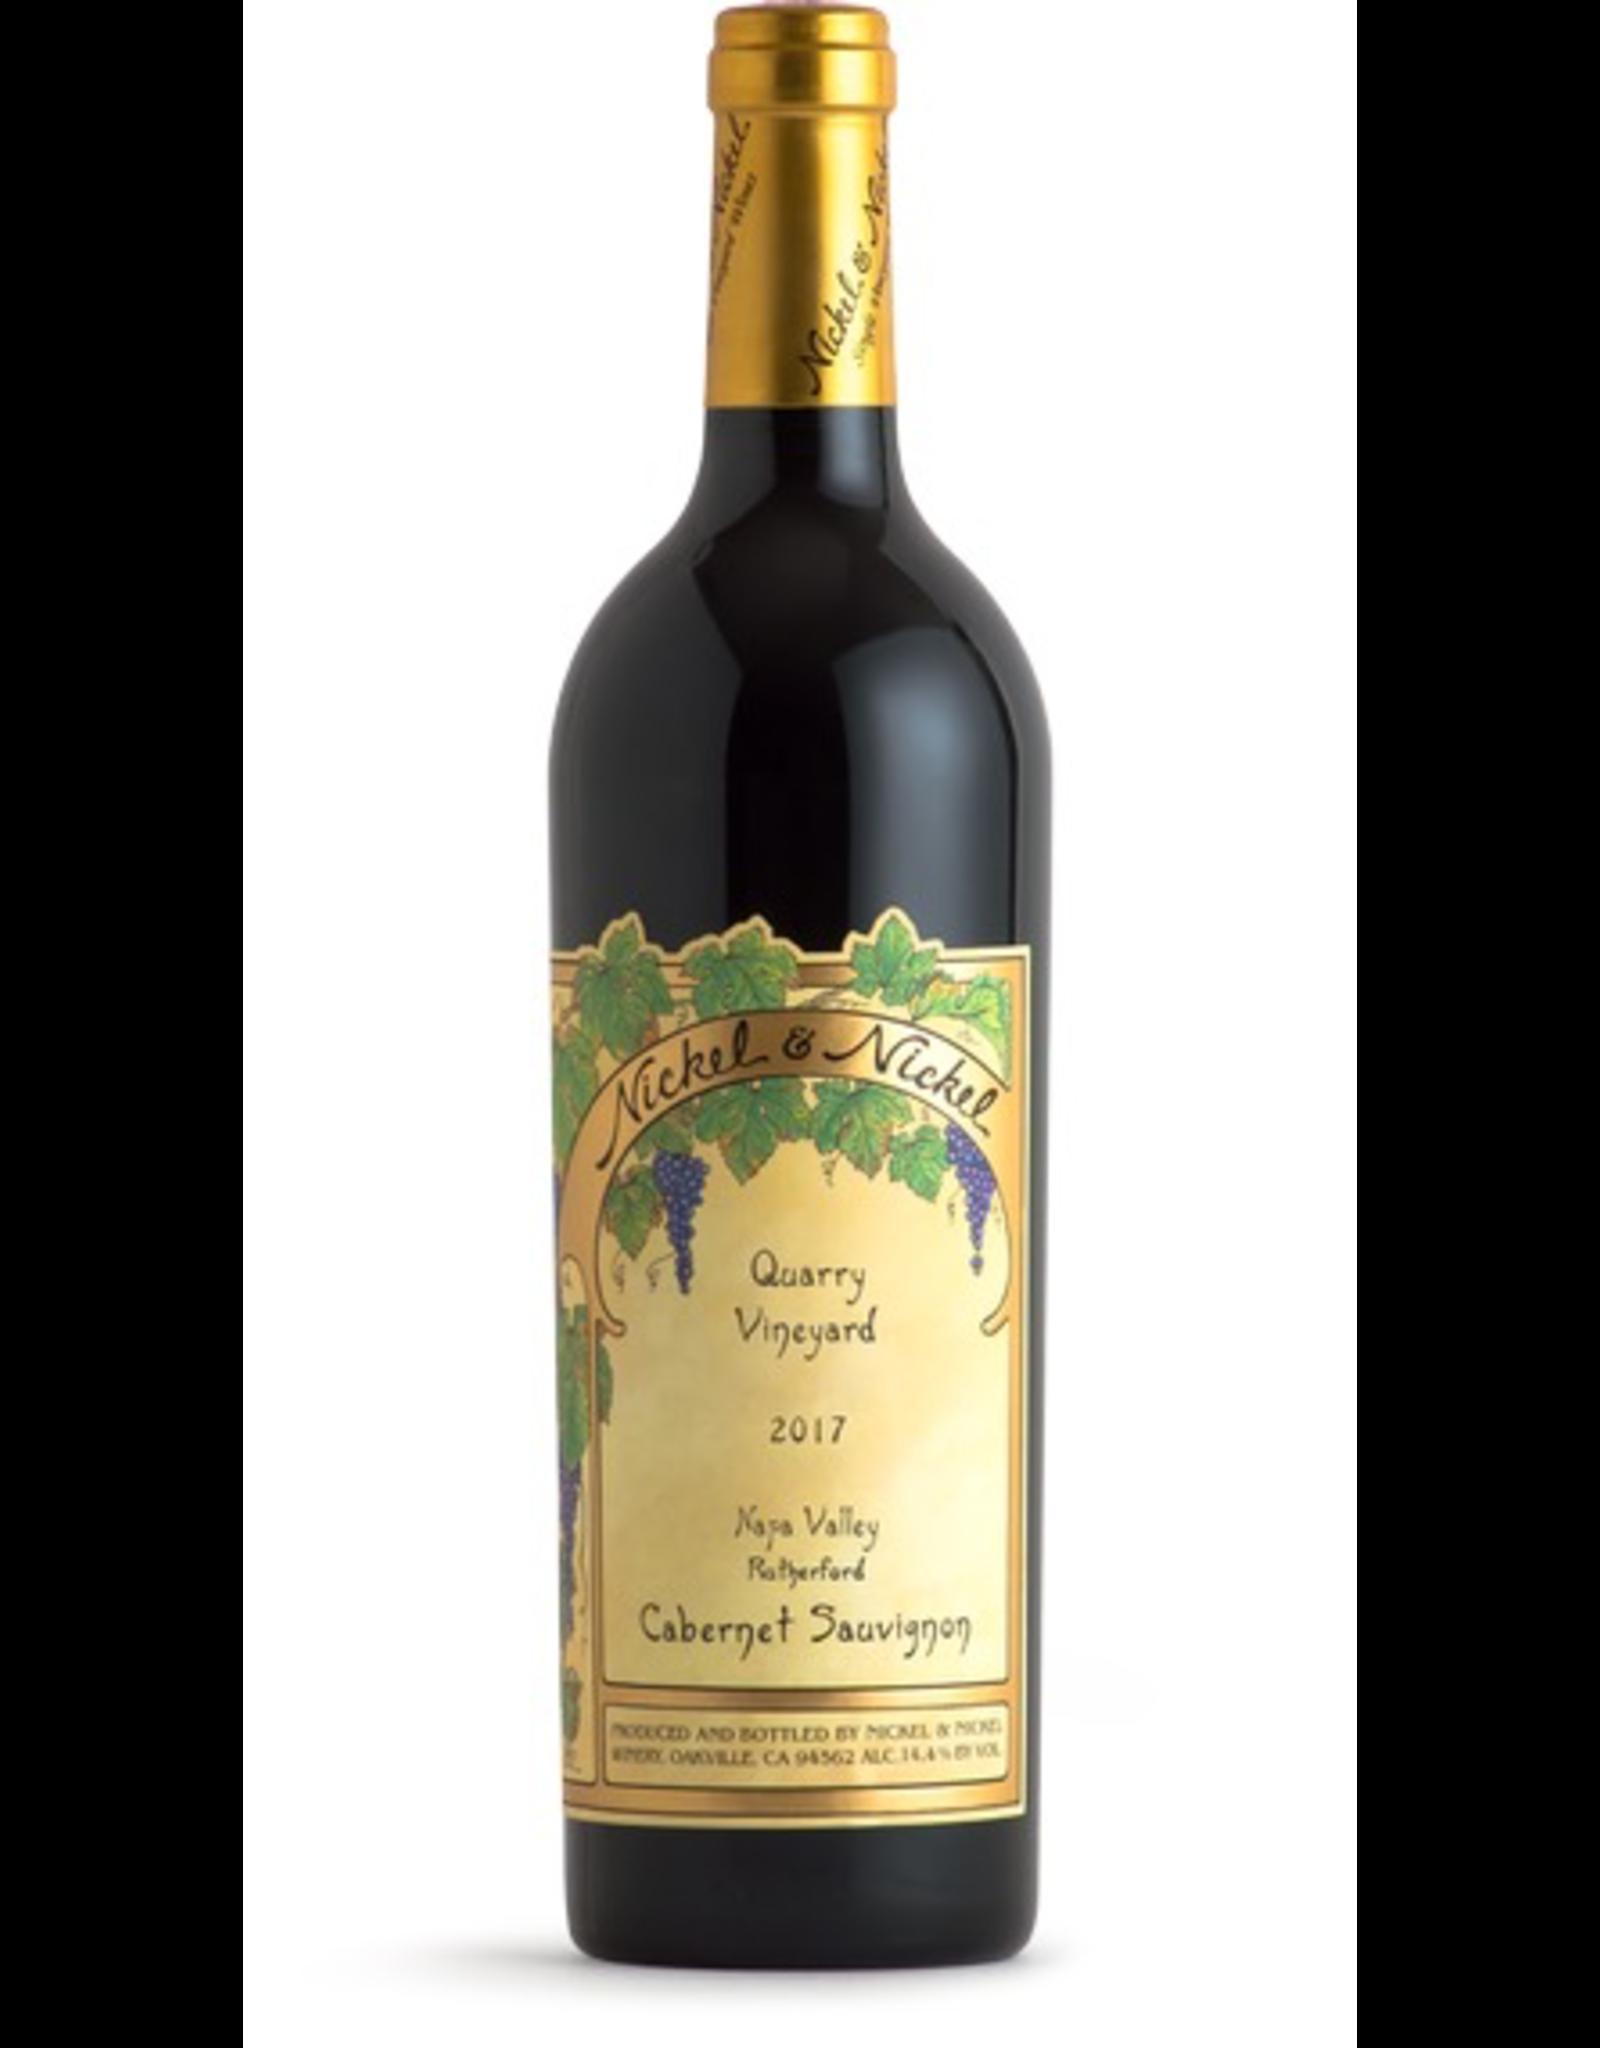 Red Wine 2017, Nickel & Nickel, Quarry Vineyard, Cabernet Sauvignon, Rutherford, Napa Valley, California, 14.4% Alc, CTnr, TW93